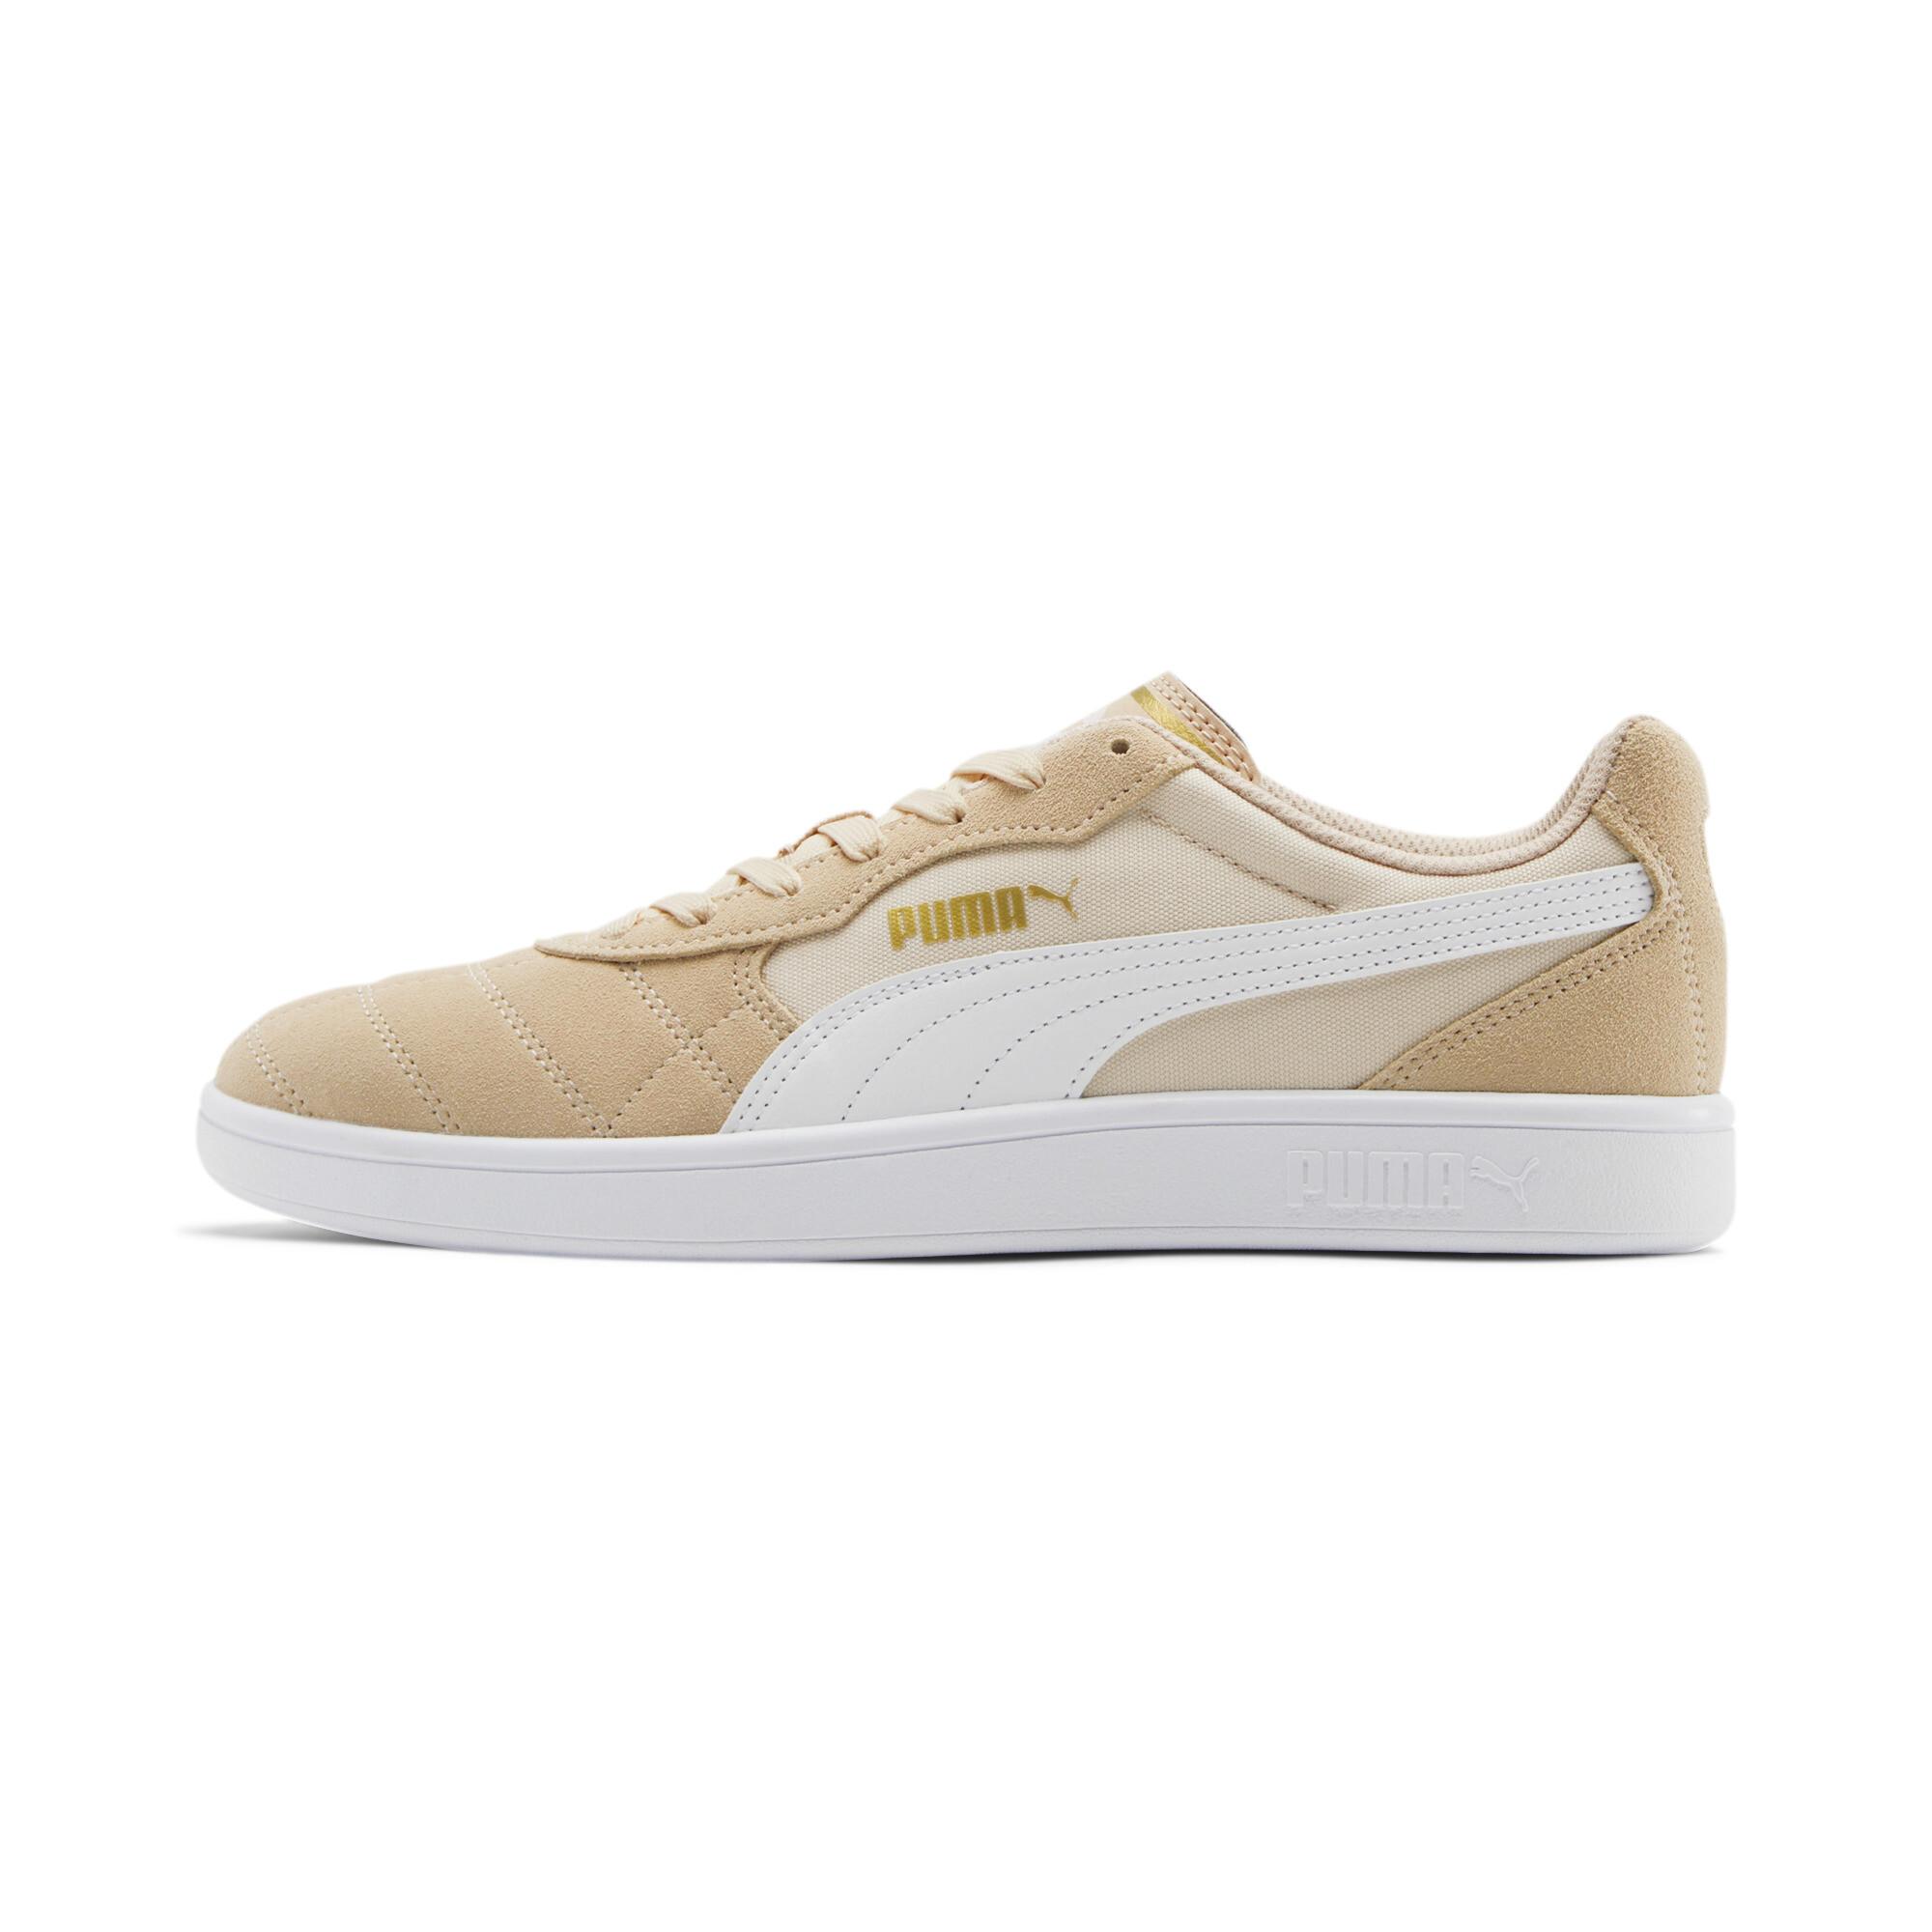 PUMA-Men-039-s-Astro-Kick-Sneakers thumbnail 31